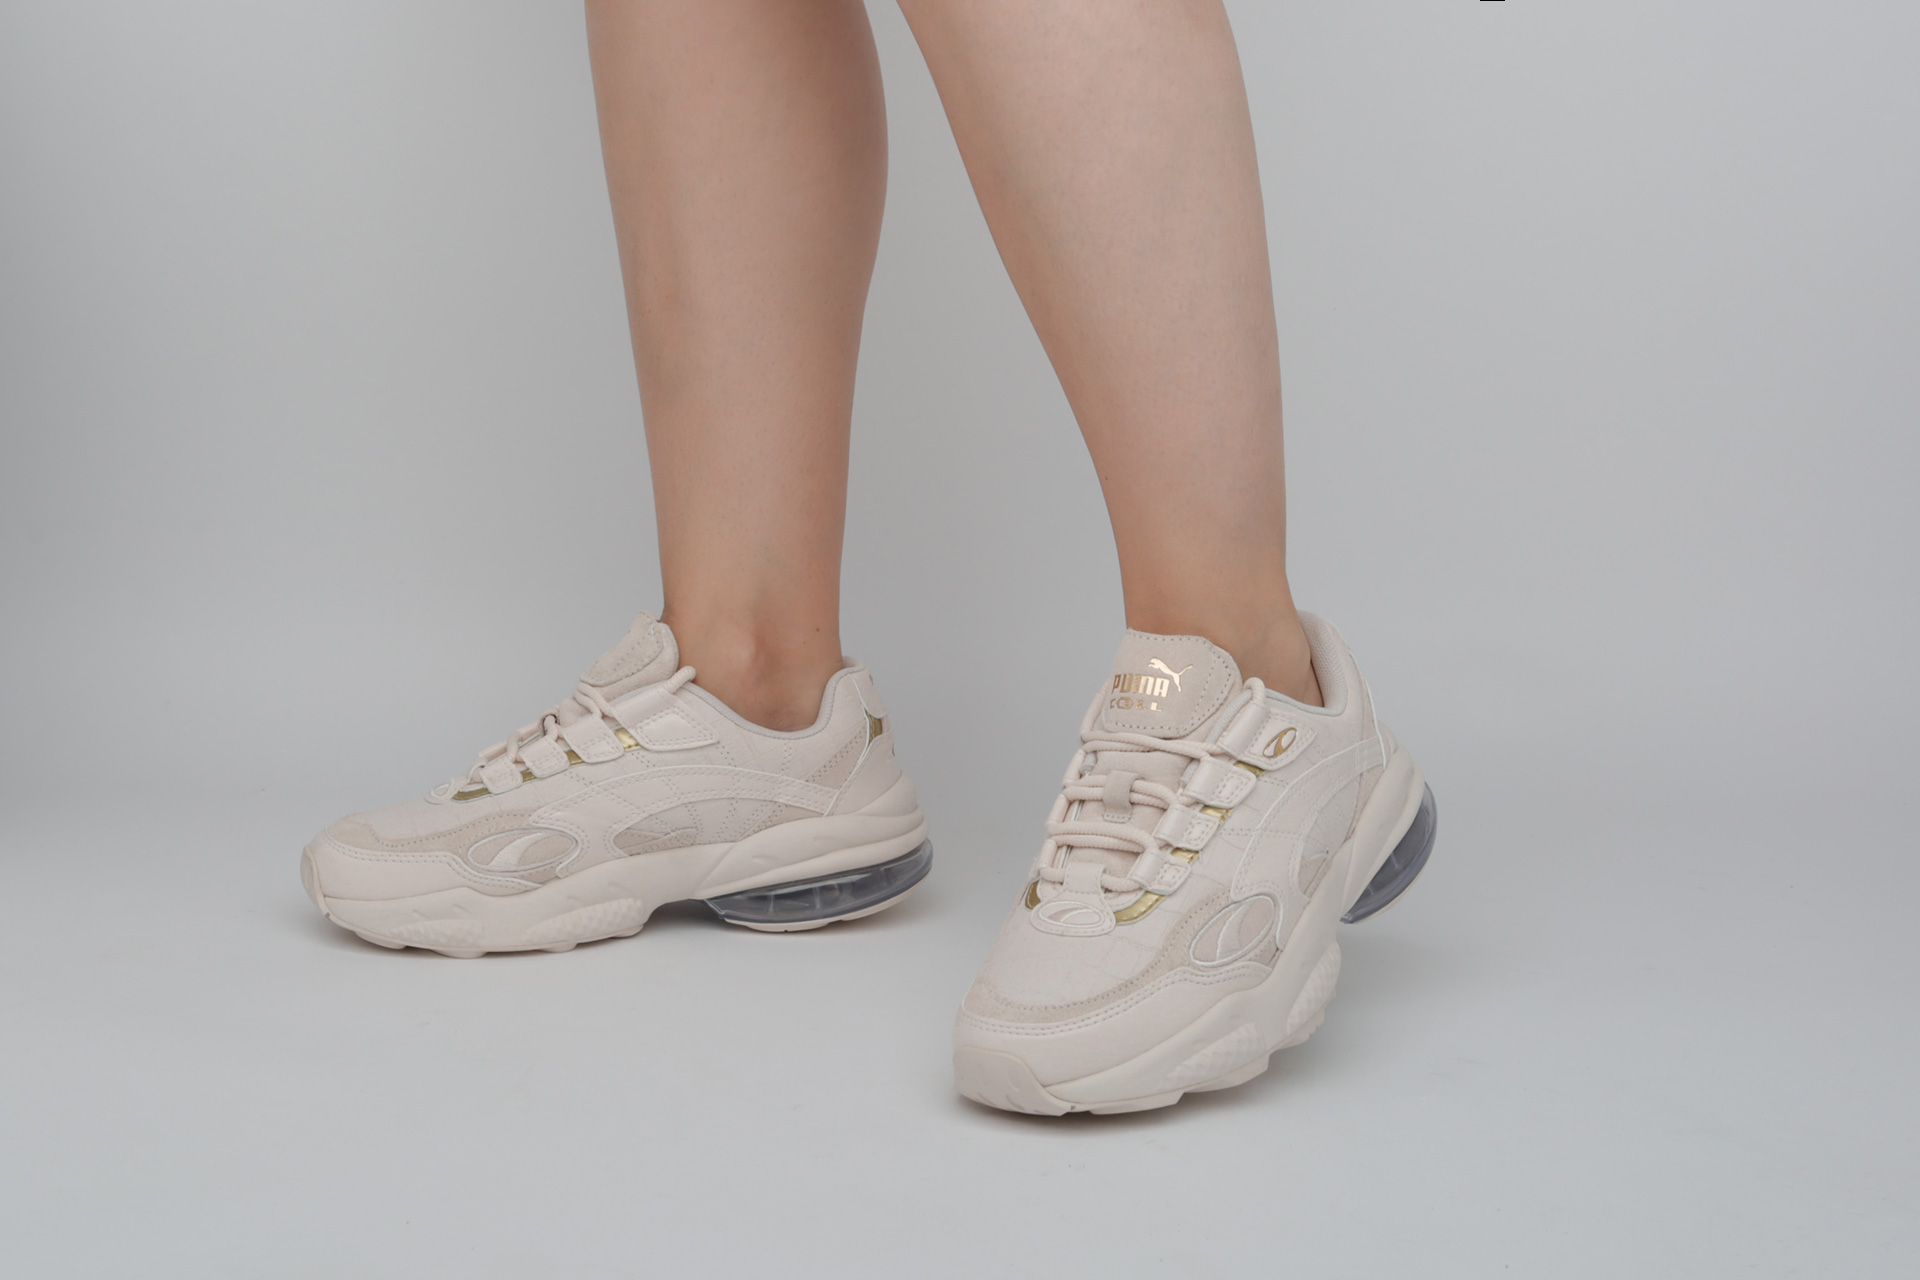 Купить бежевые женские кроссовки Cell Venom Hypertech Wn's ...